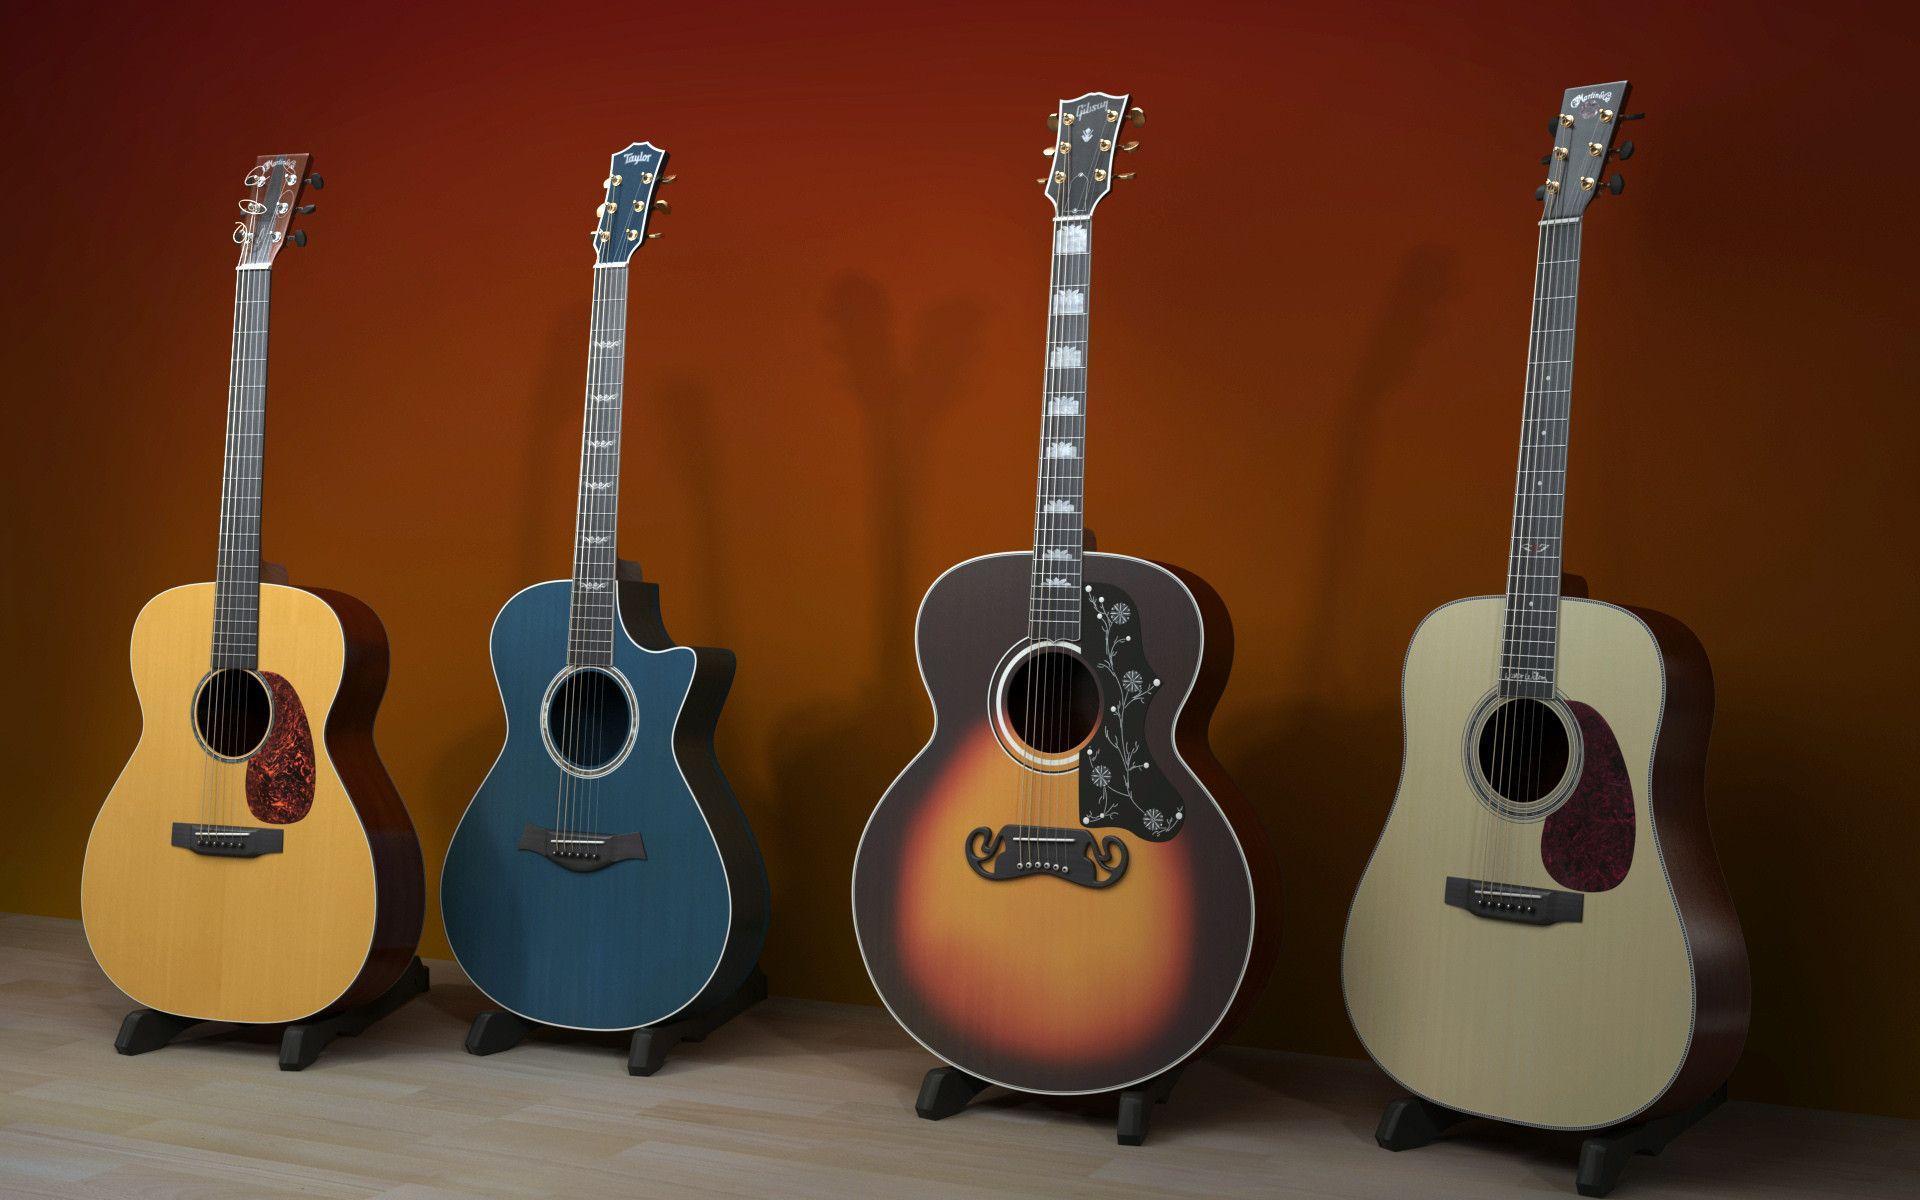 taylor guitars wallpapers - photo #17